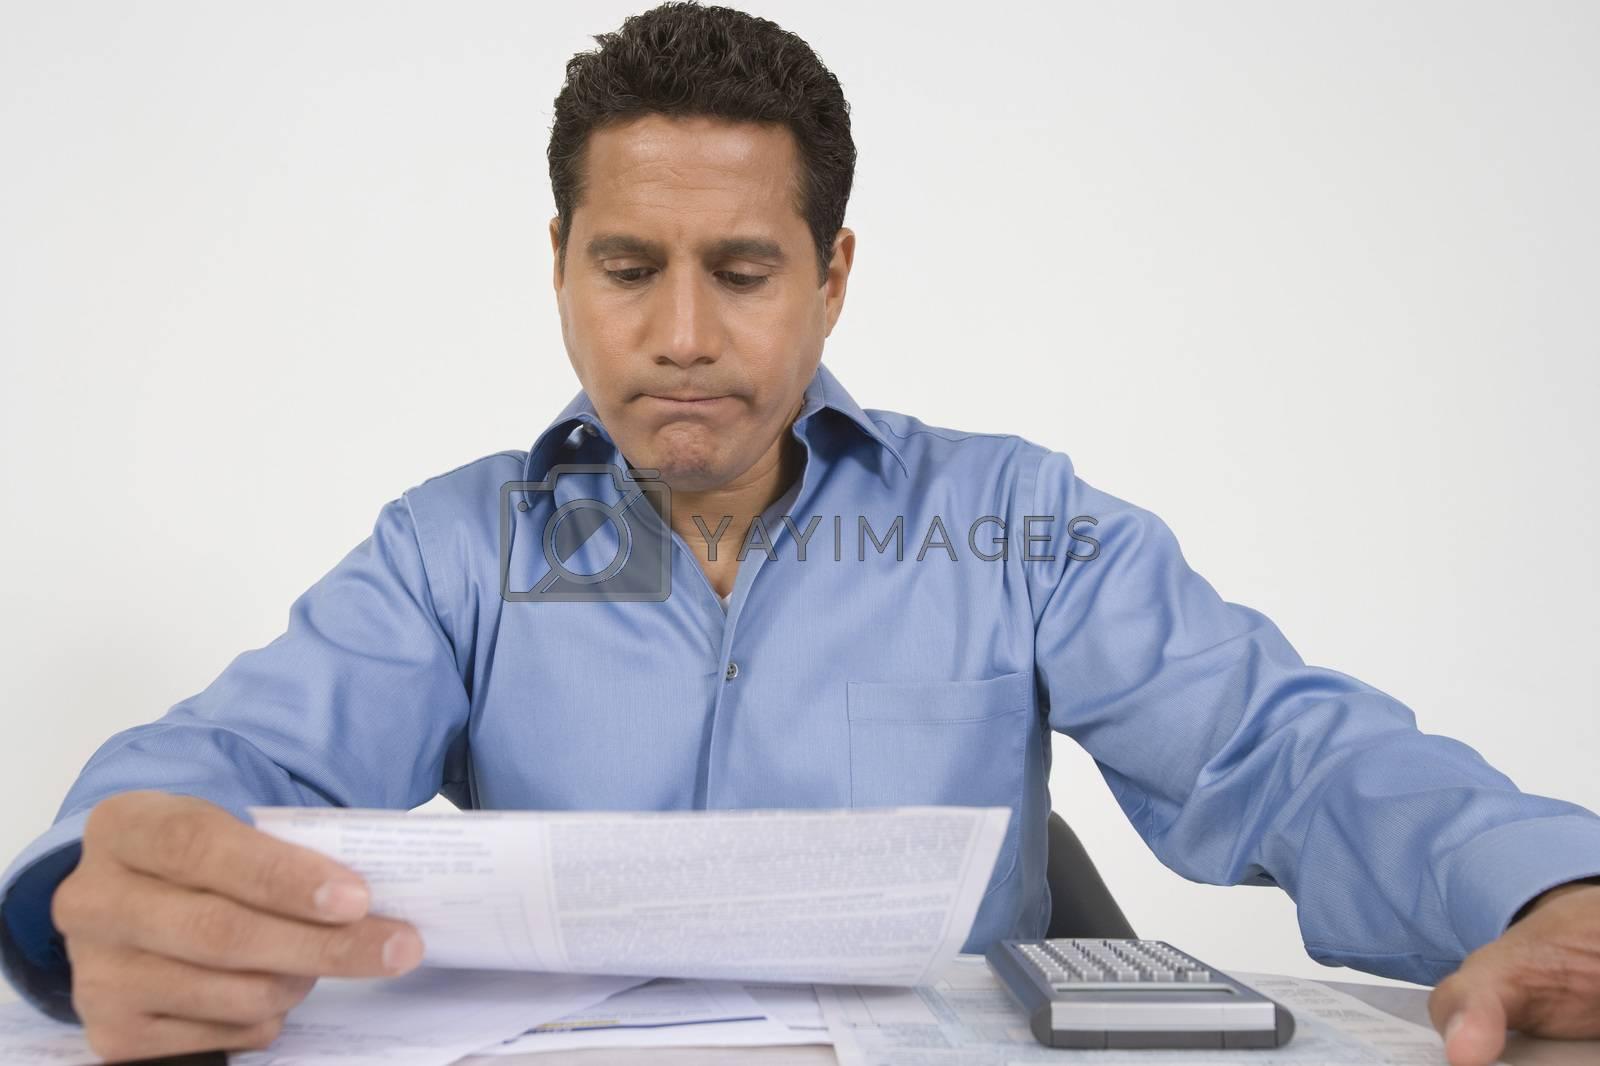 Man Reading Financial Document